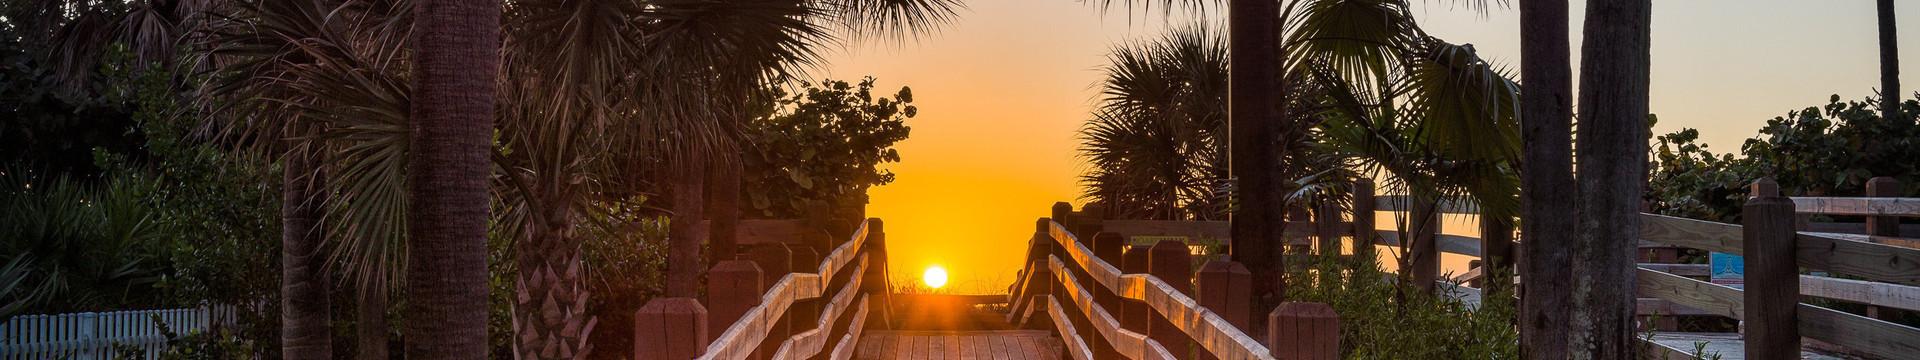 Boardwalk - Westgate Resorts